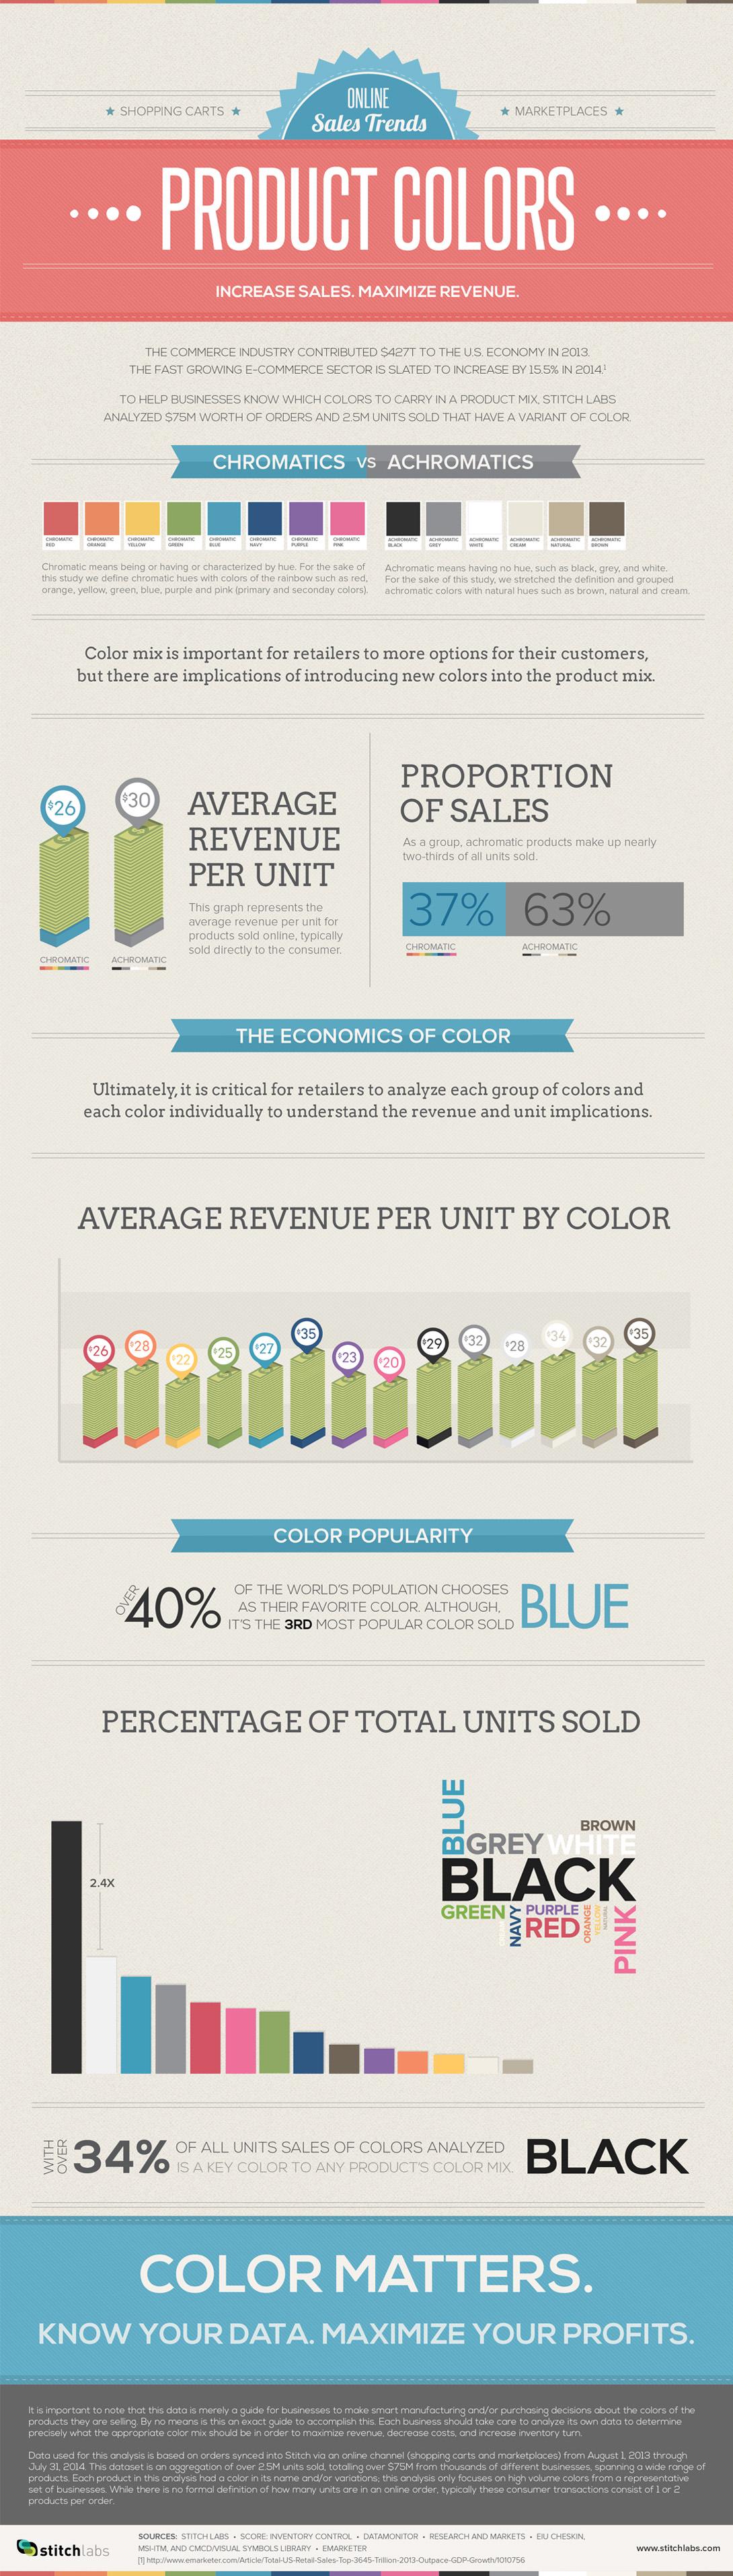 inventory-management-online-sales-color-matters